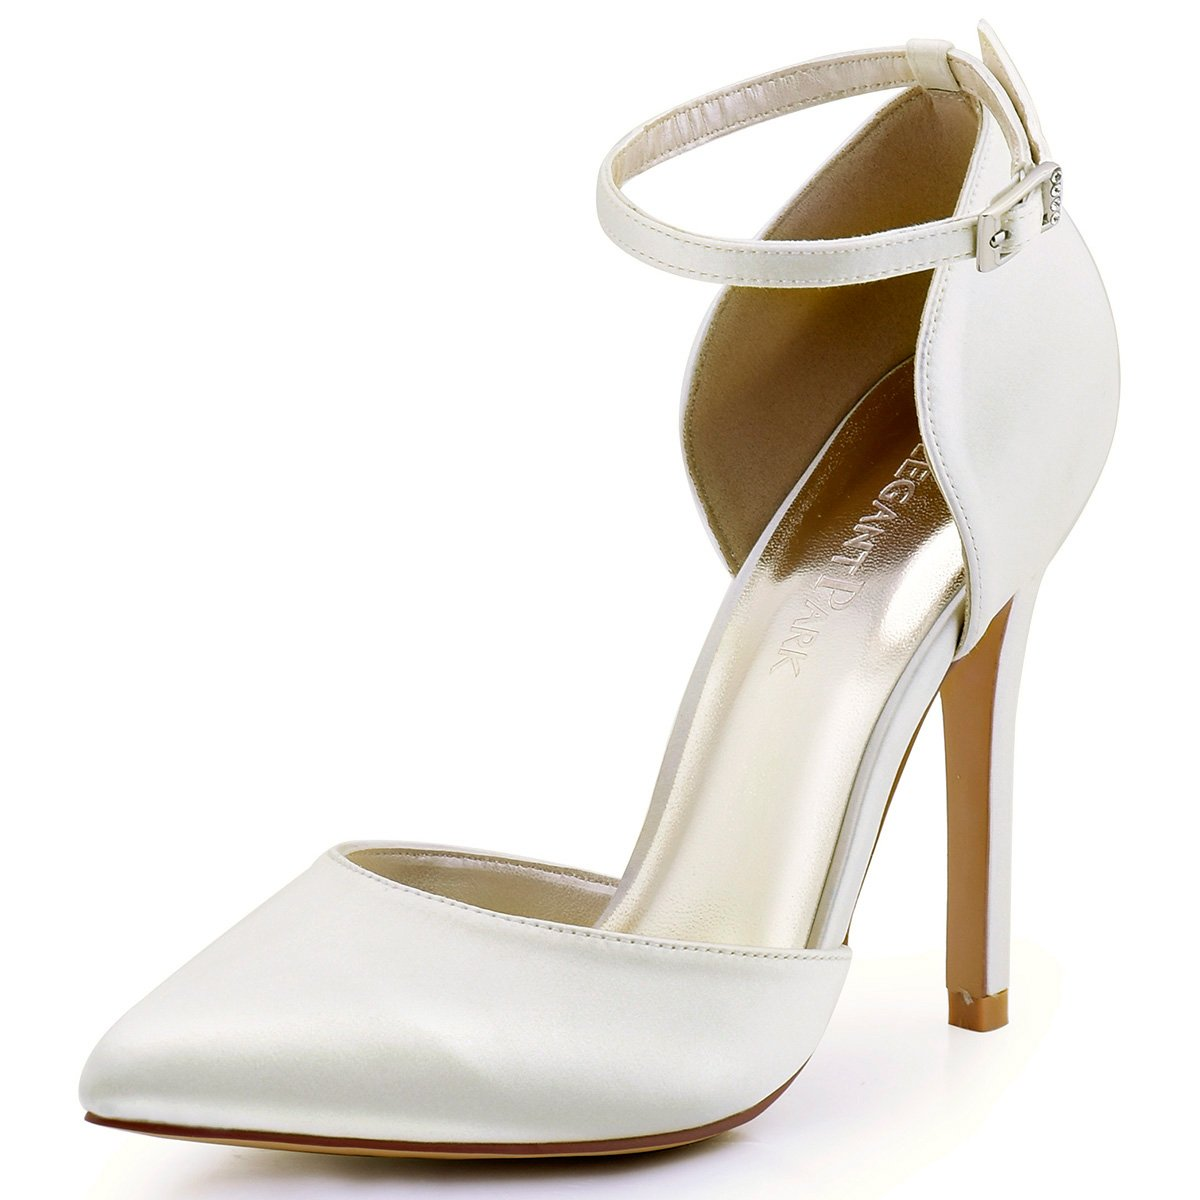 ElegantPark HC1602 Women's Pointed Toe High Heel Ankle Strap D'Orsay Pumps Satin Wedding Dress Shoes Ivory US 10